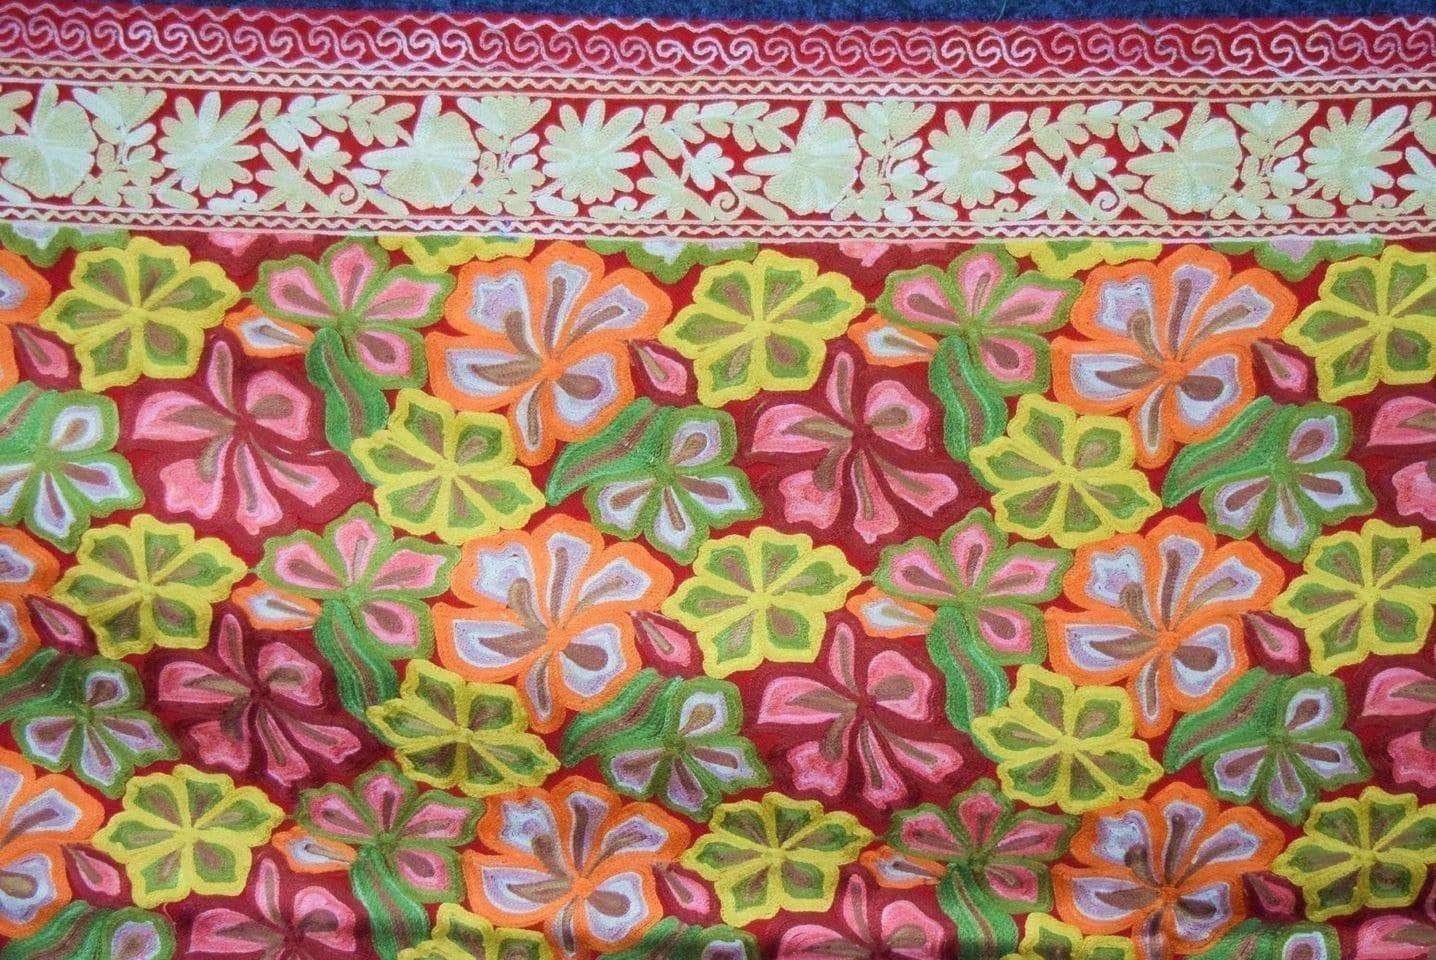 Kashmiri Stole Heavy Embroidery Work pure wool Pashmina wrap C0677 2